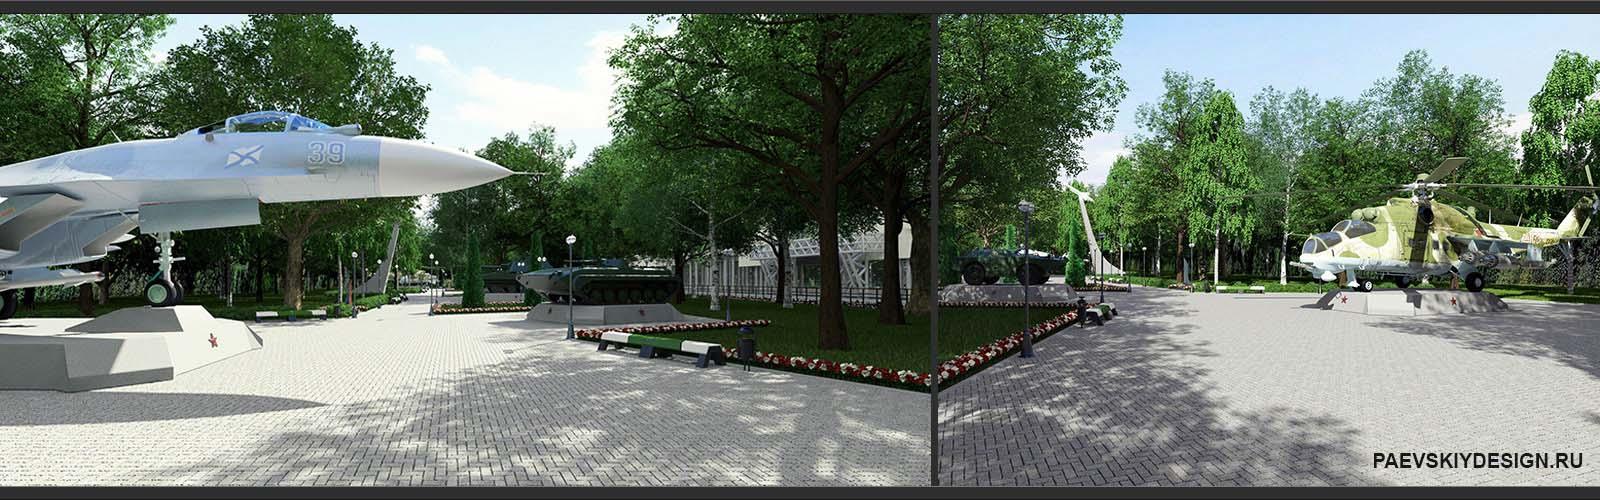 Дизайн парка проект